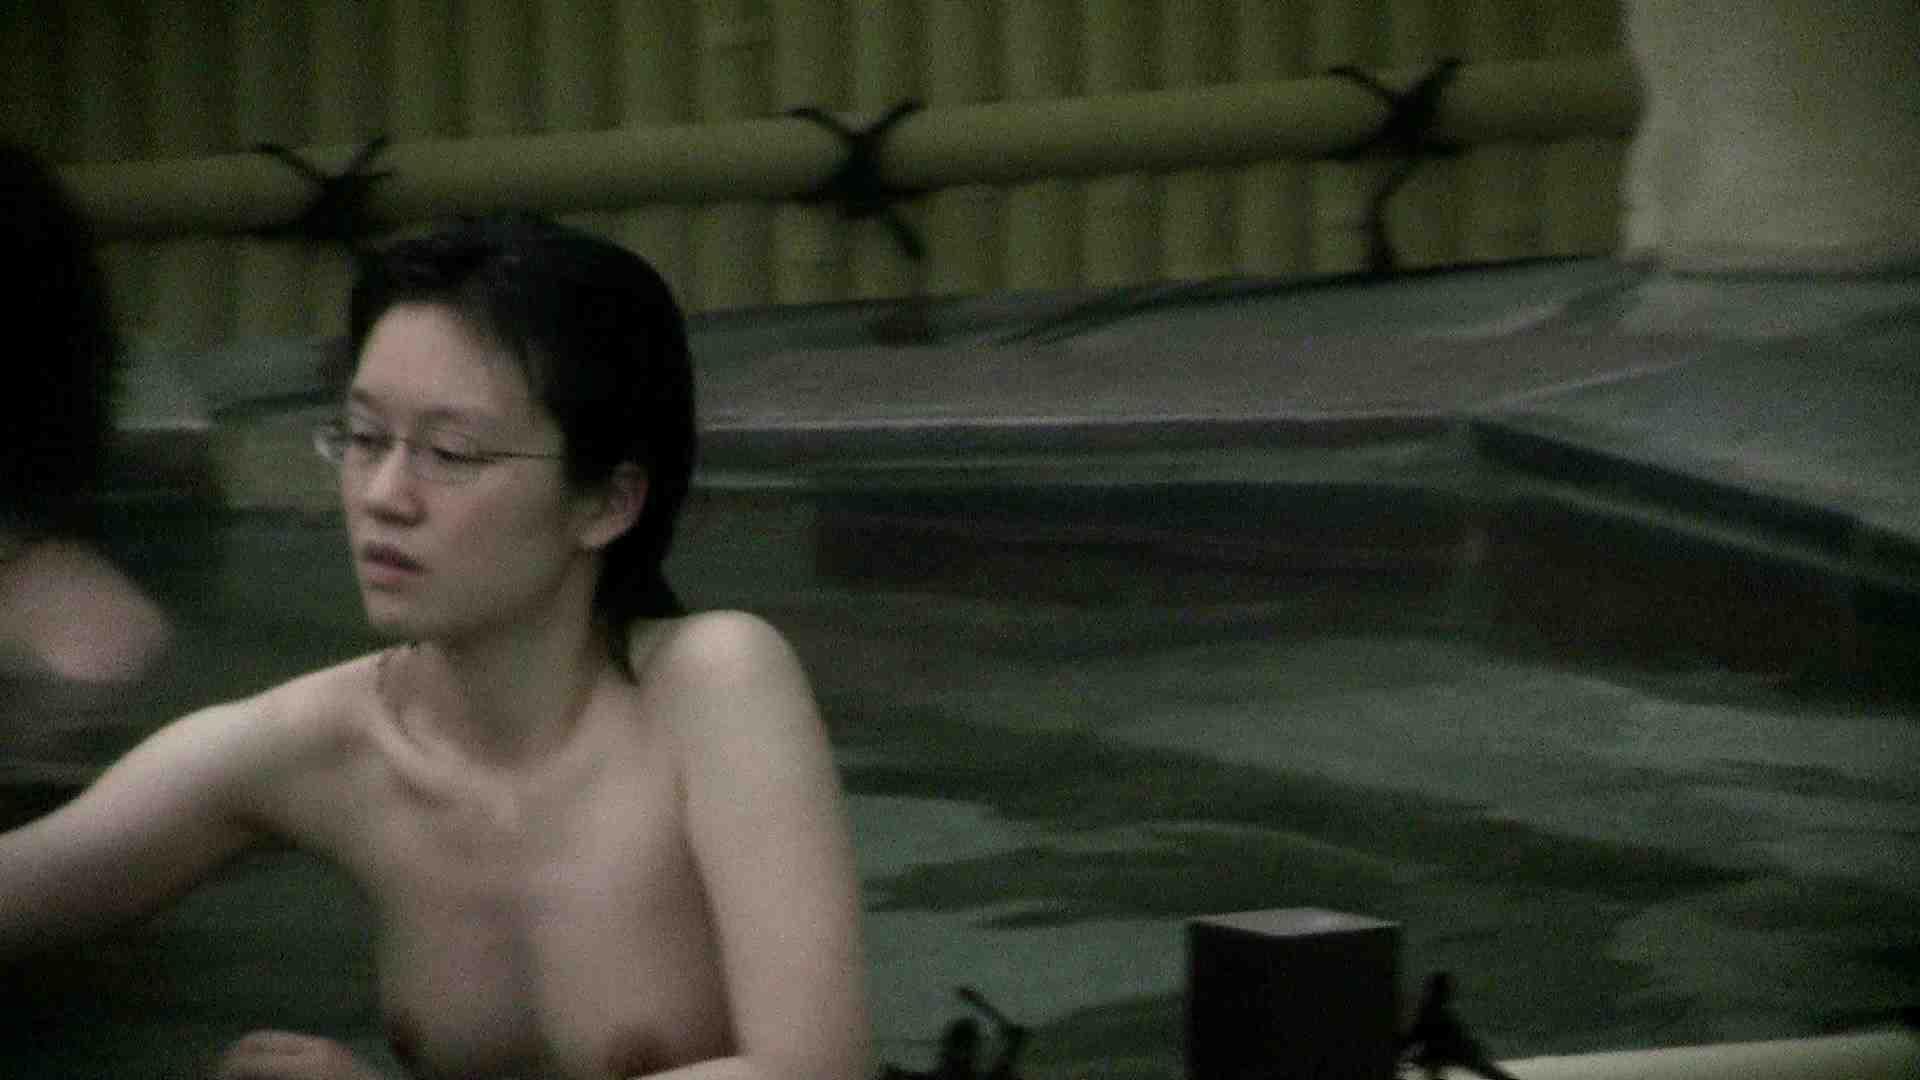 Aquaな露天風呂Vol.684 OLのエロ生活   露天風呂  59連発 37